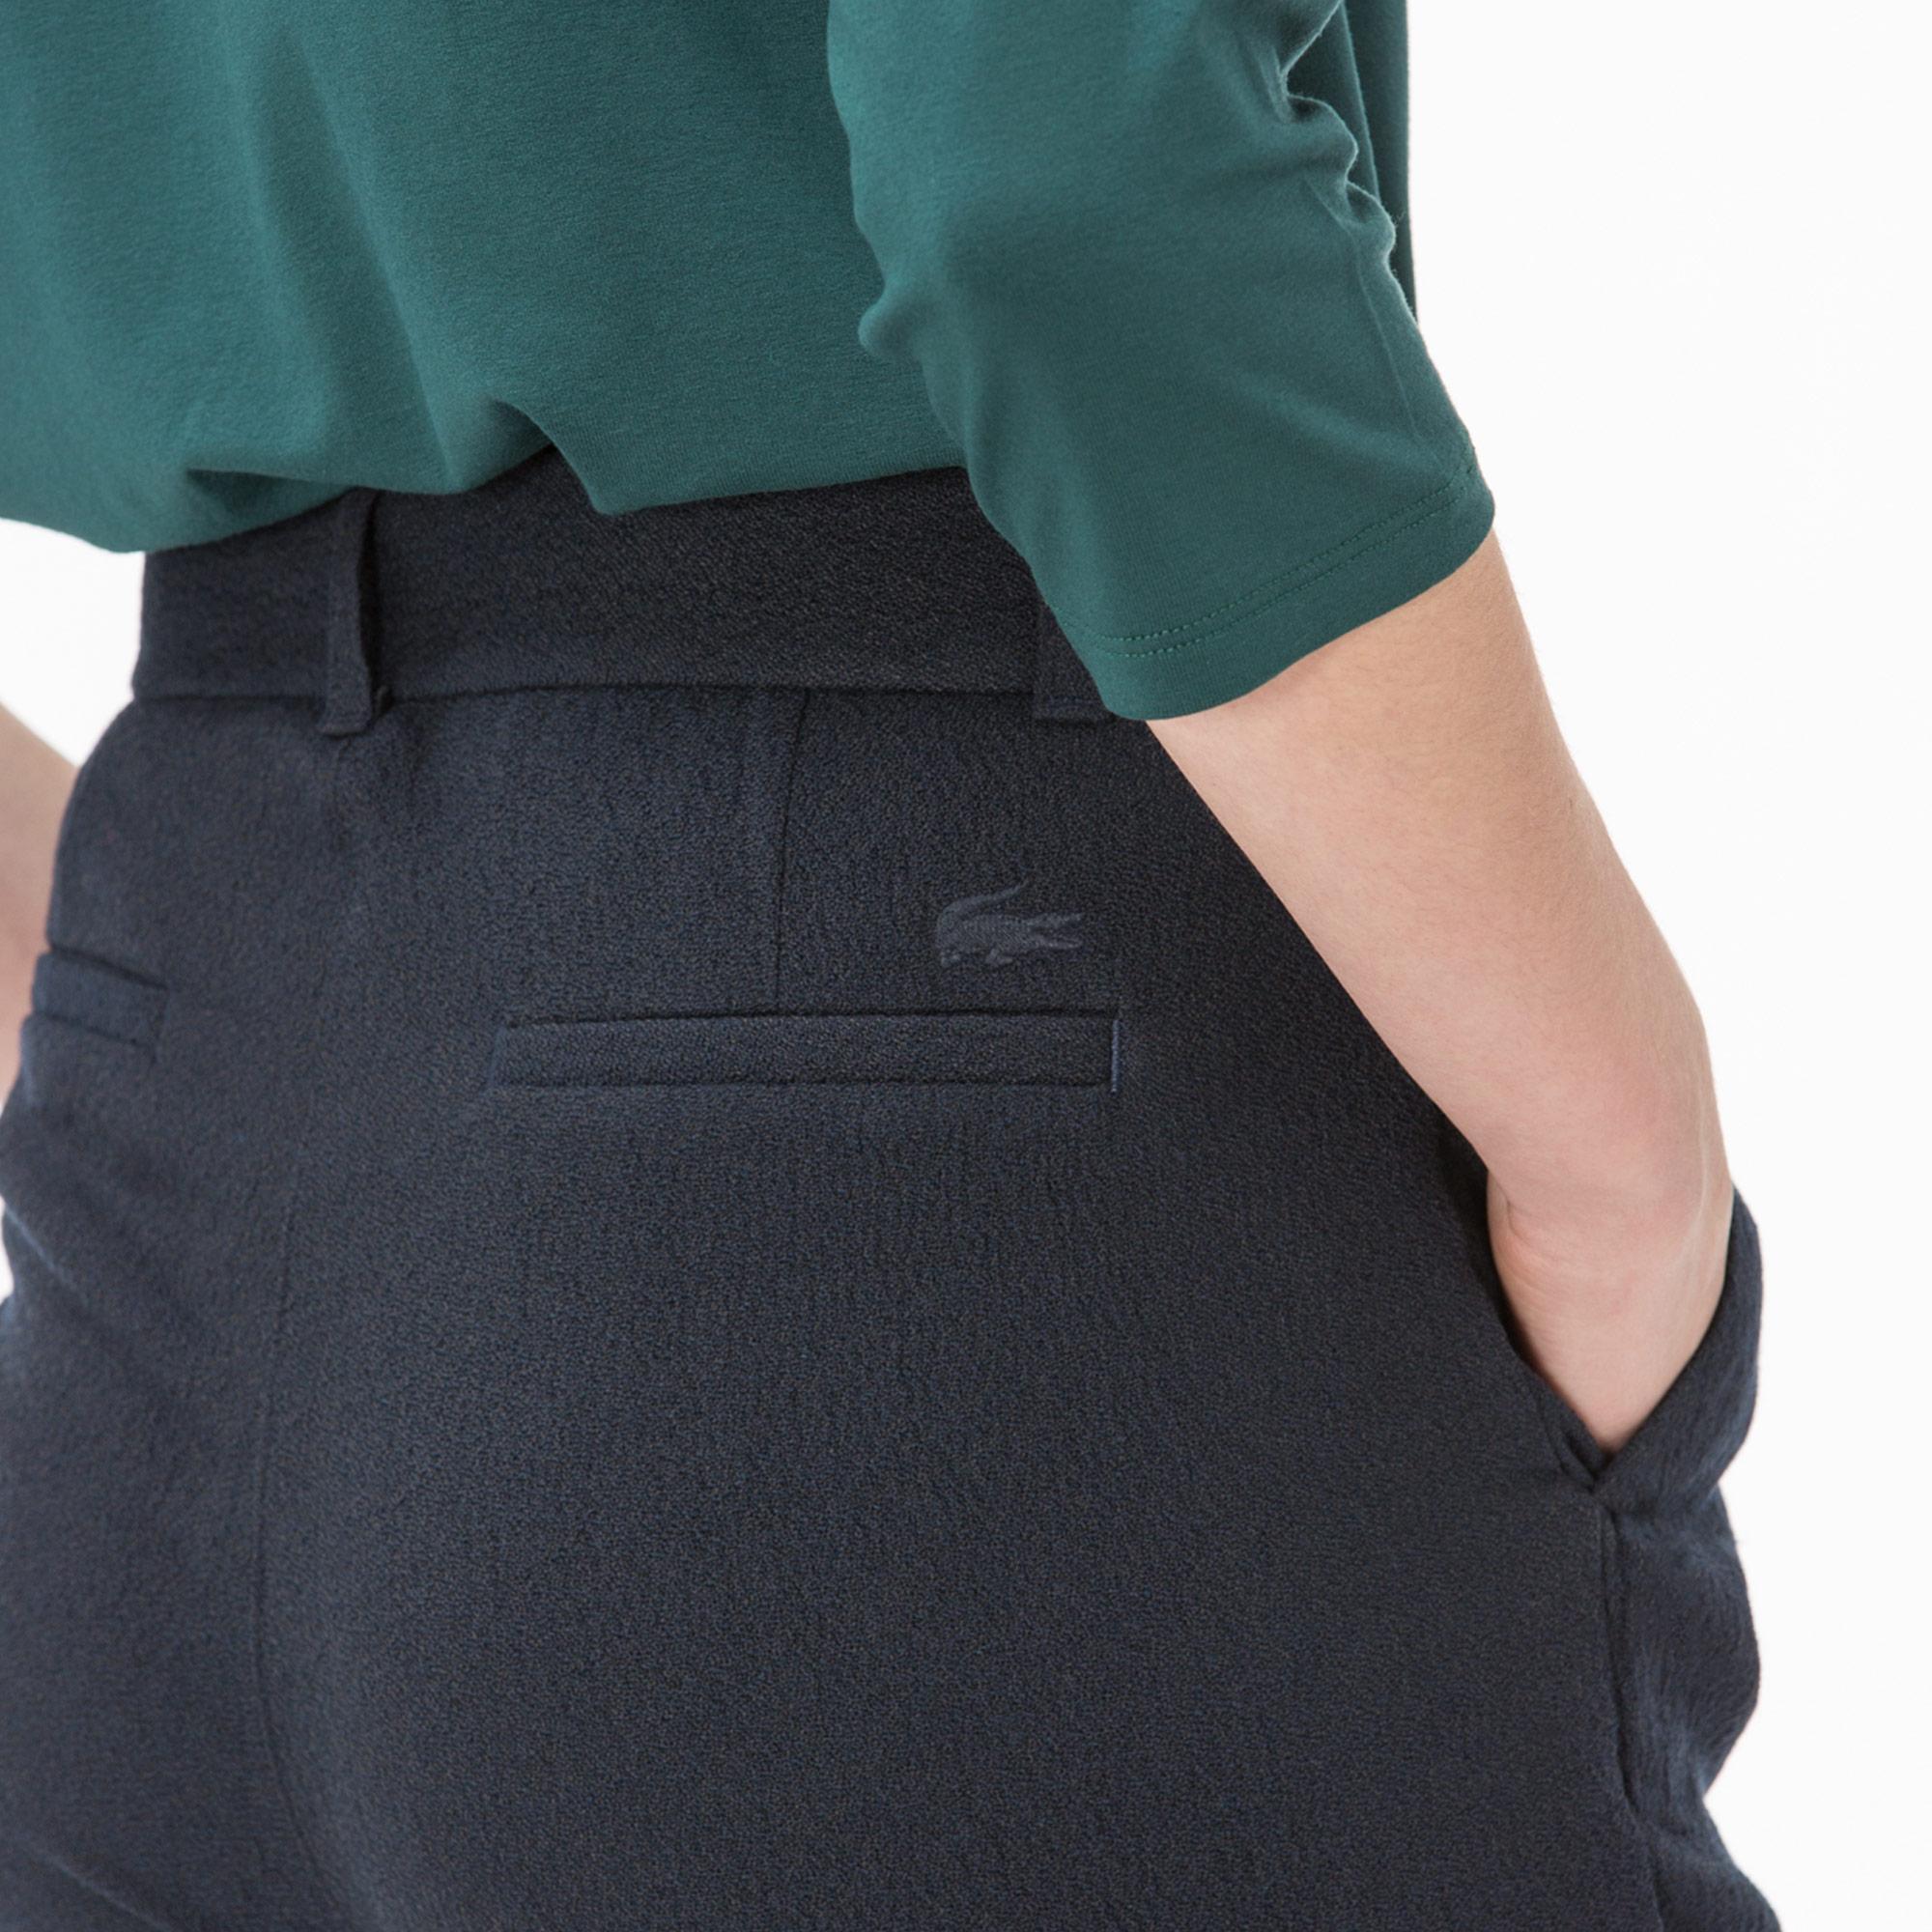 Фото 4 - Женские брюки Lacoste темно-синего цвета